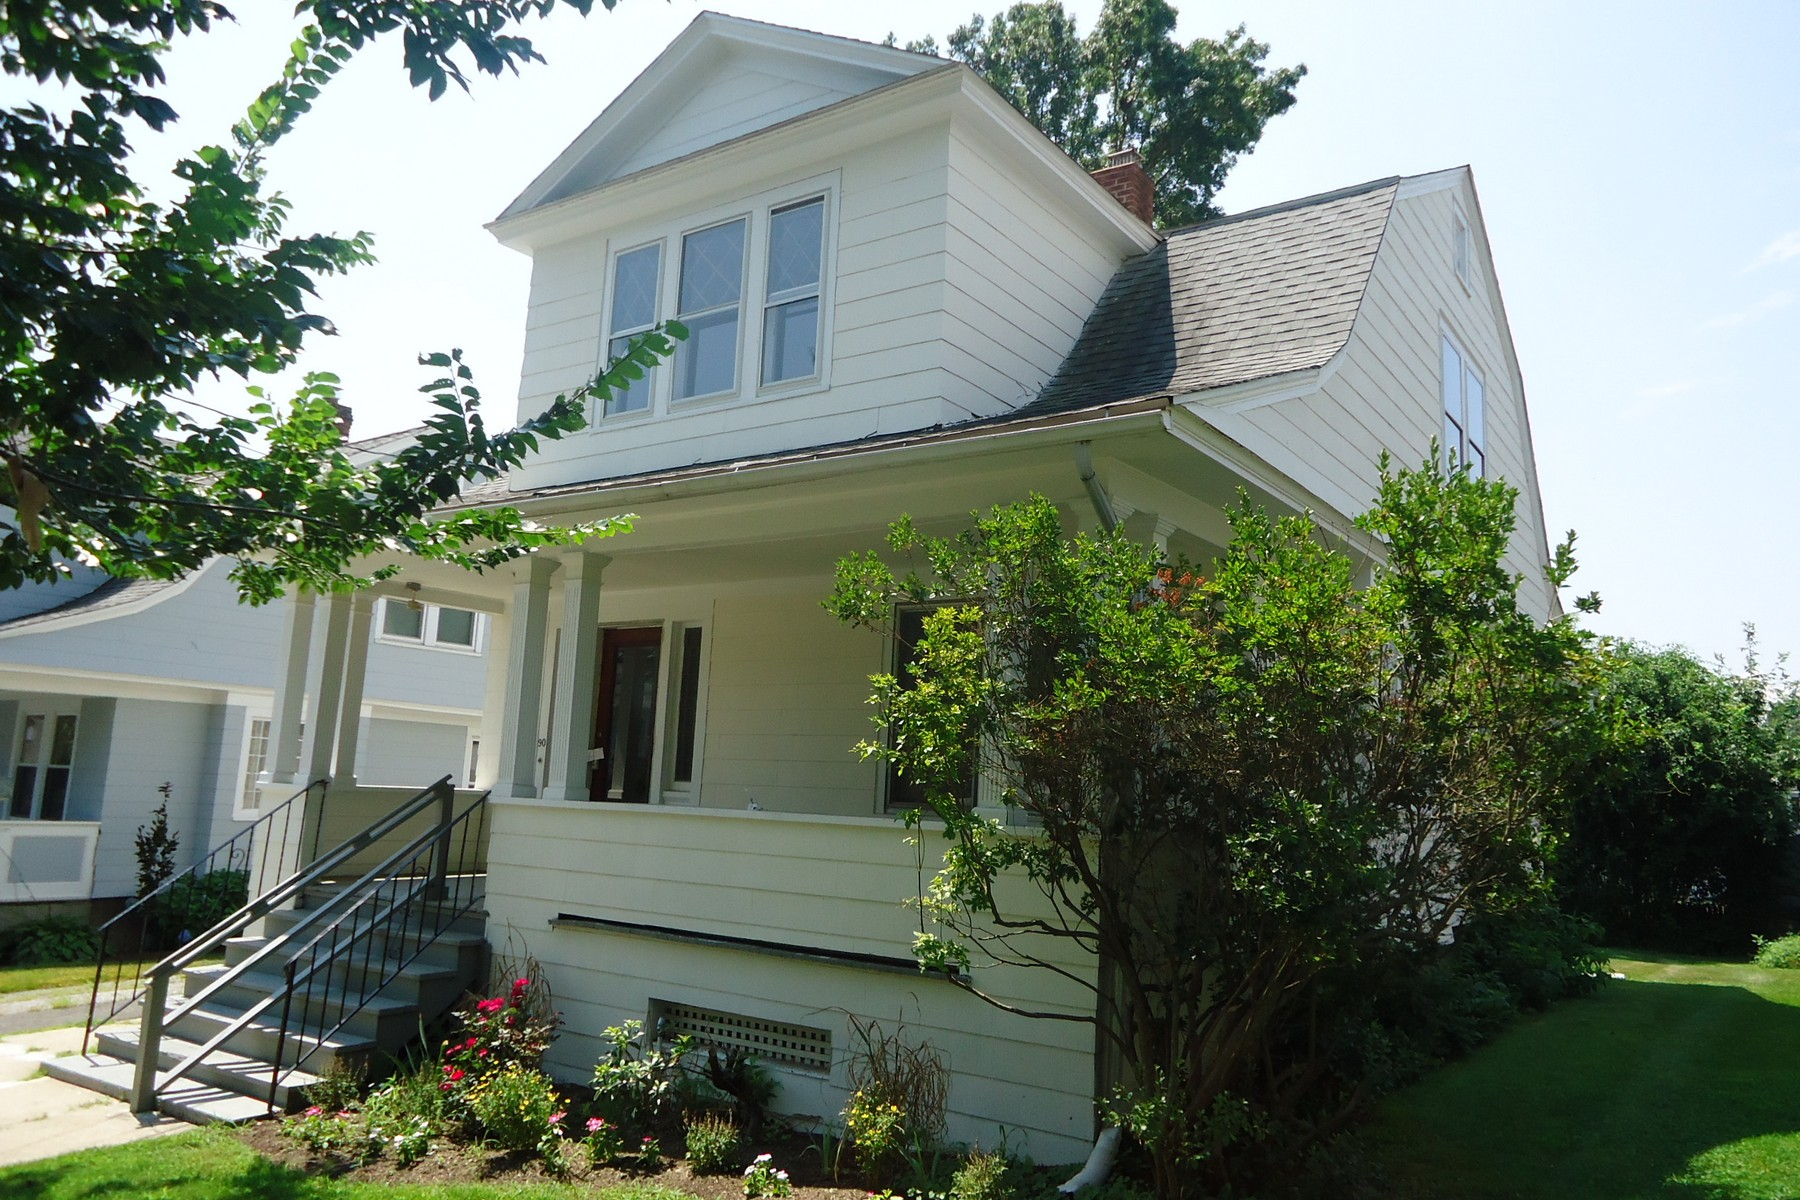 Tek Ailelik Ev için Satış at Just Renovated 1915 Colonial Loaded with Character and Old Time Charm 90 Clarkson Street Bridgeport, Connecticut 06605 Amerika Birleşik Devletleri